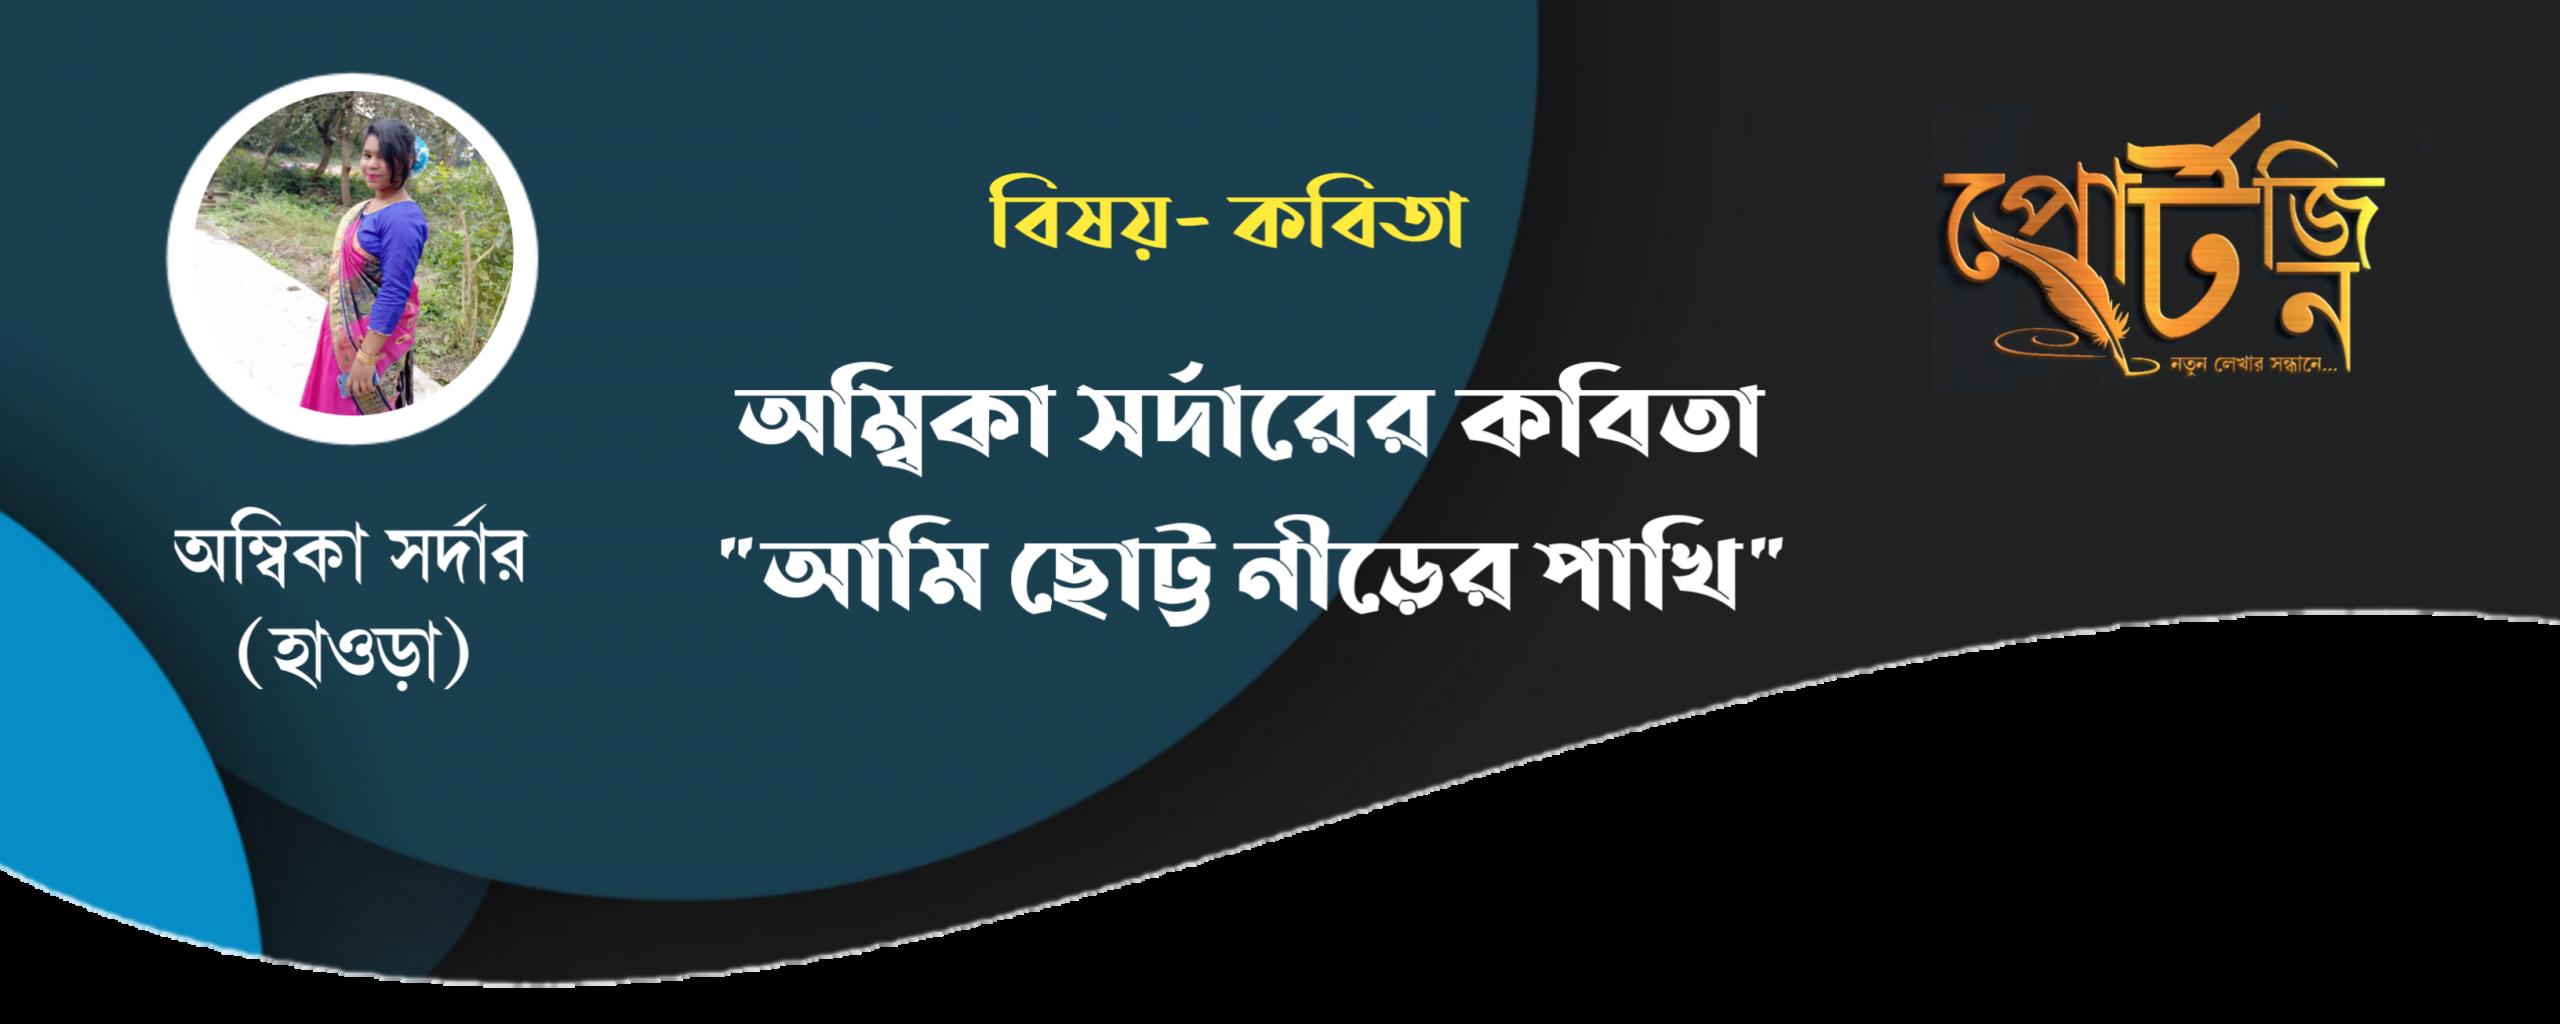 bengali kobita ambika sardar portzine bengal live